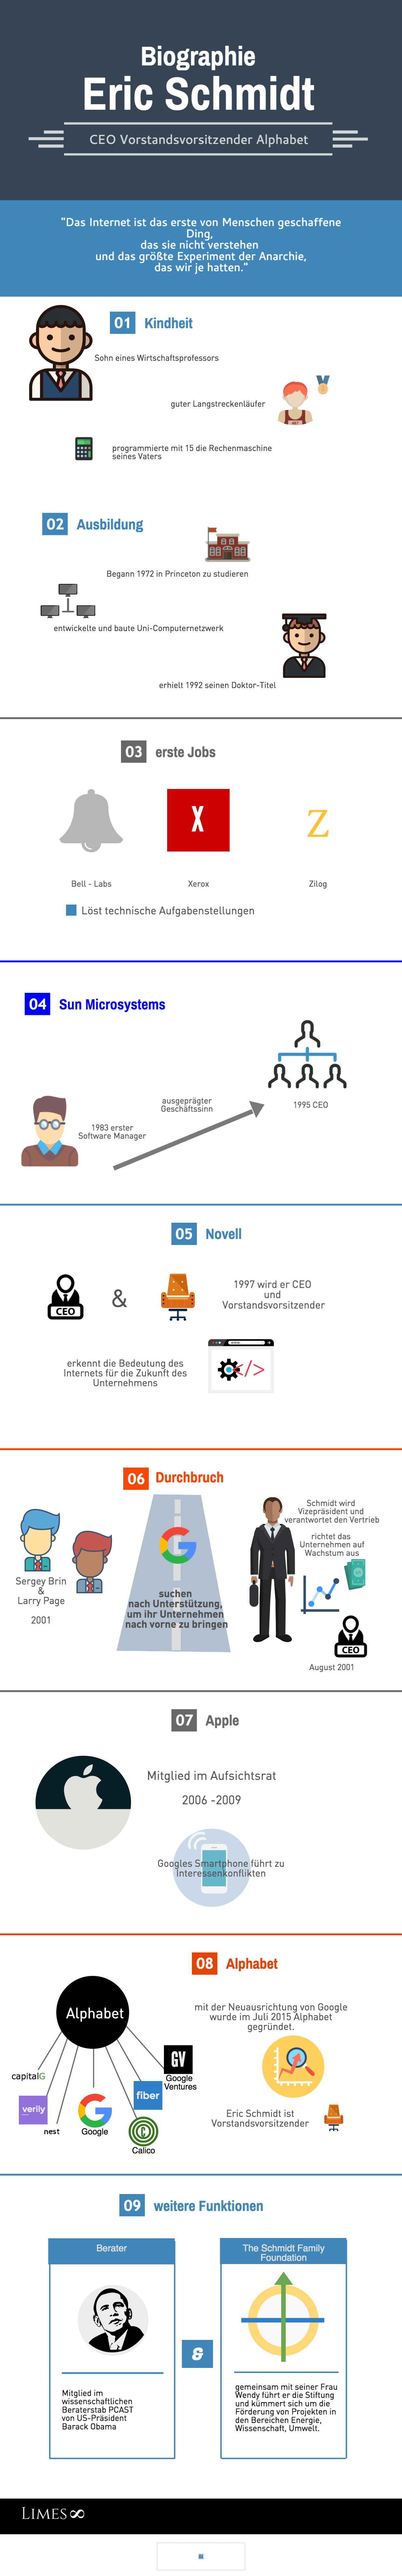 Informationsgrafik über den Milliardär Eric Schmidt